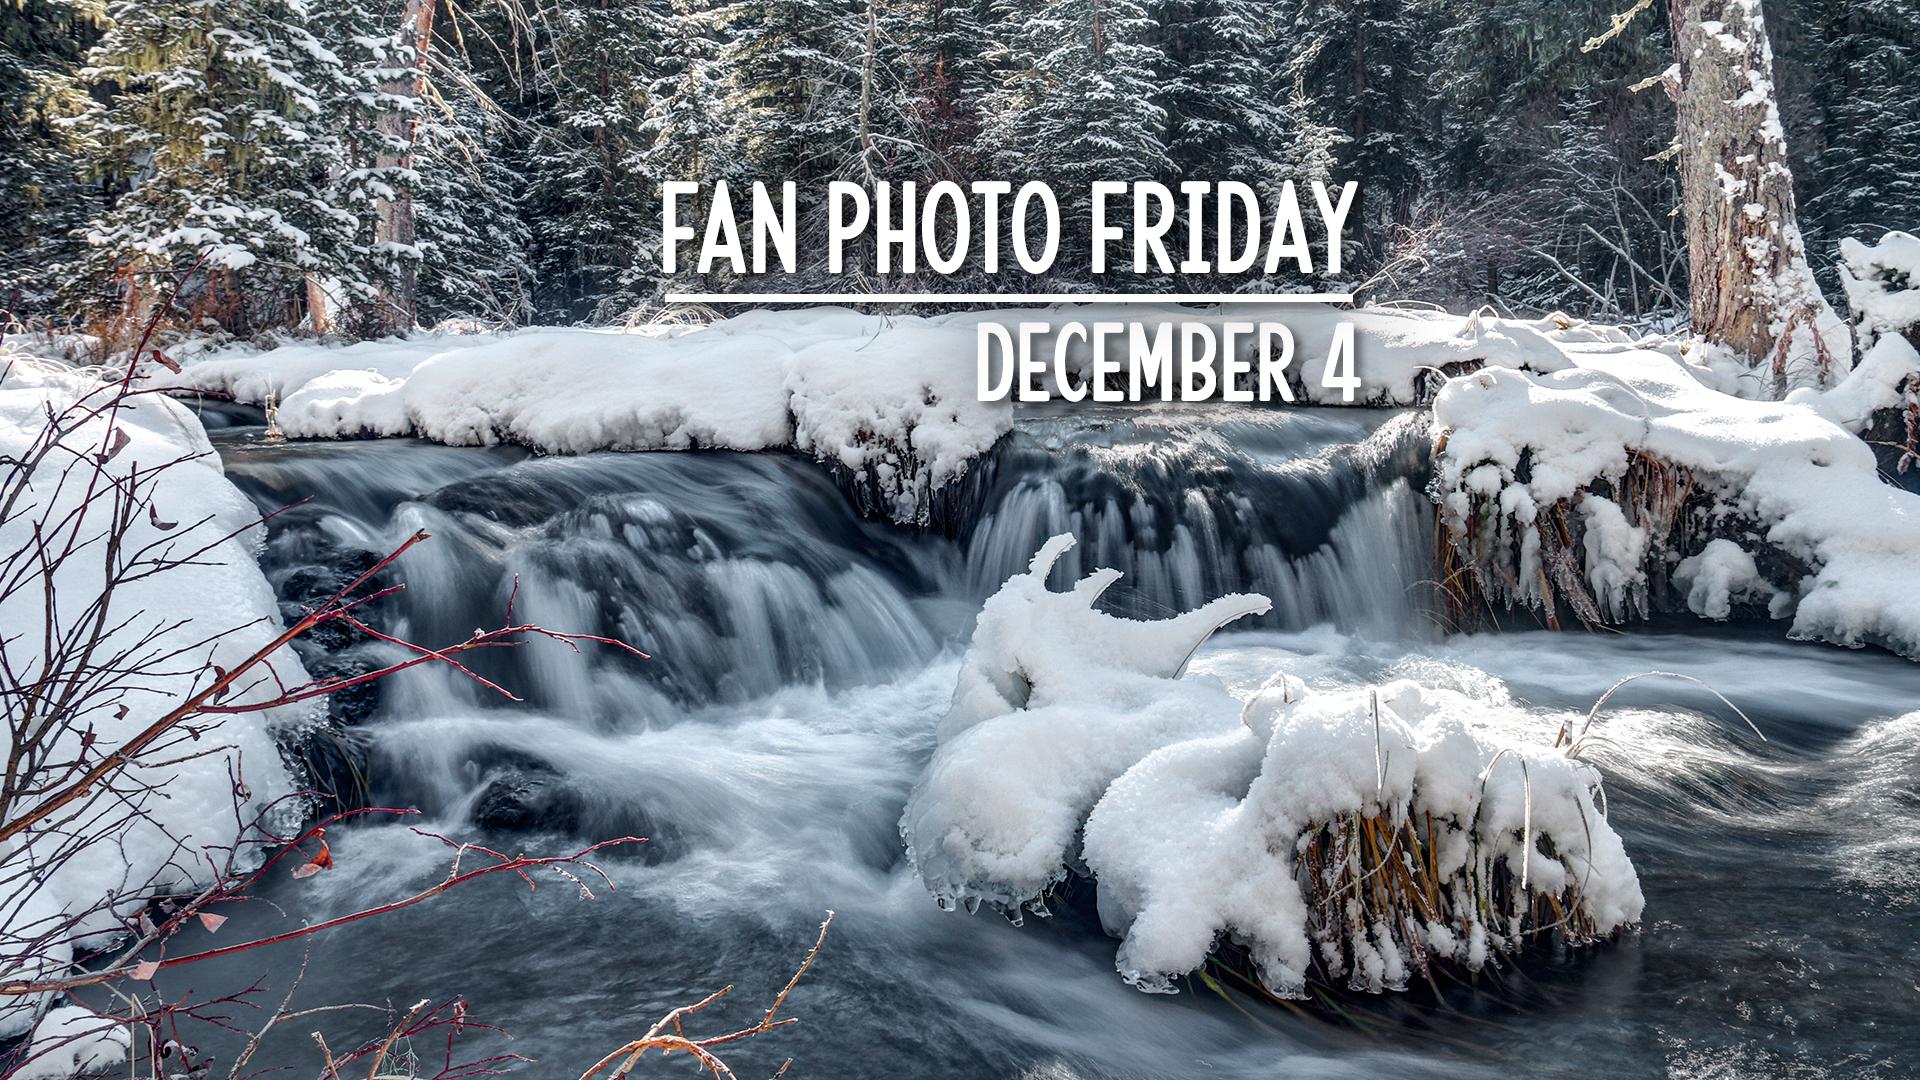 Fan Photo Friday | December 4, 2020